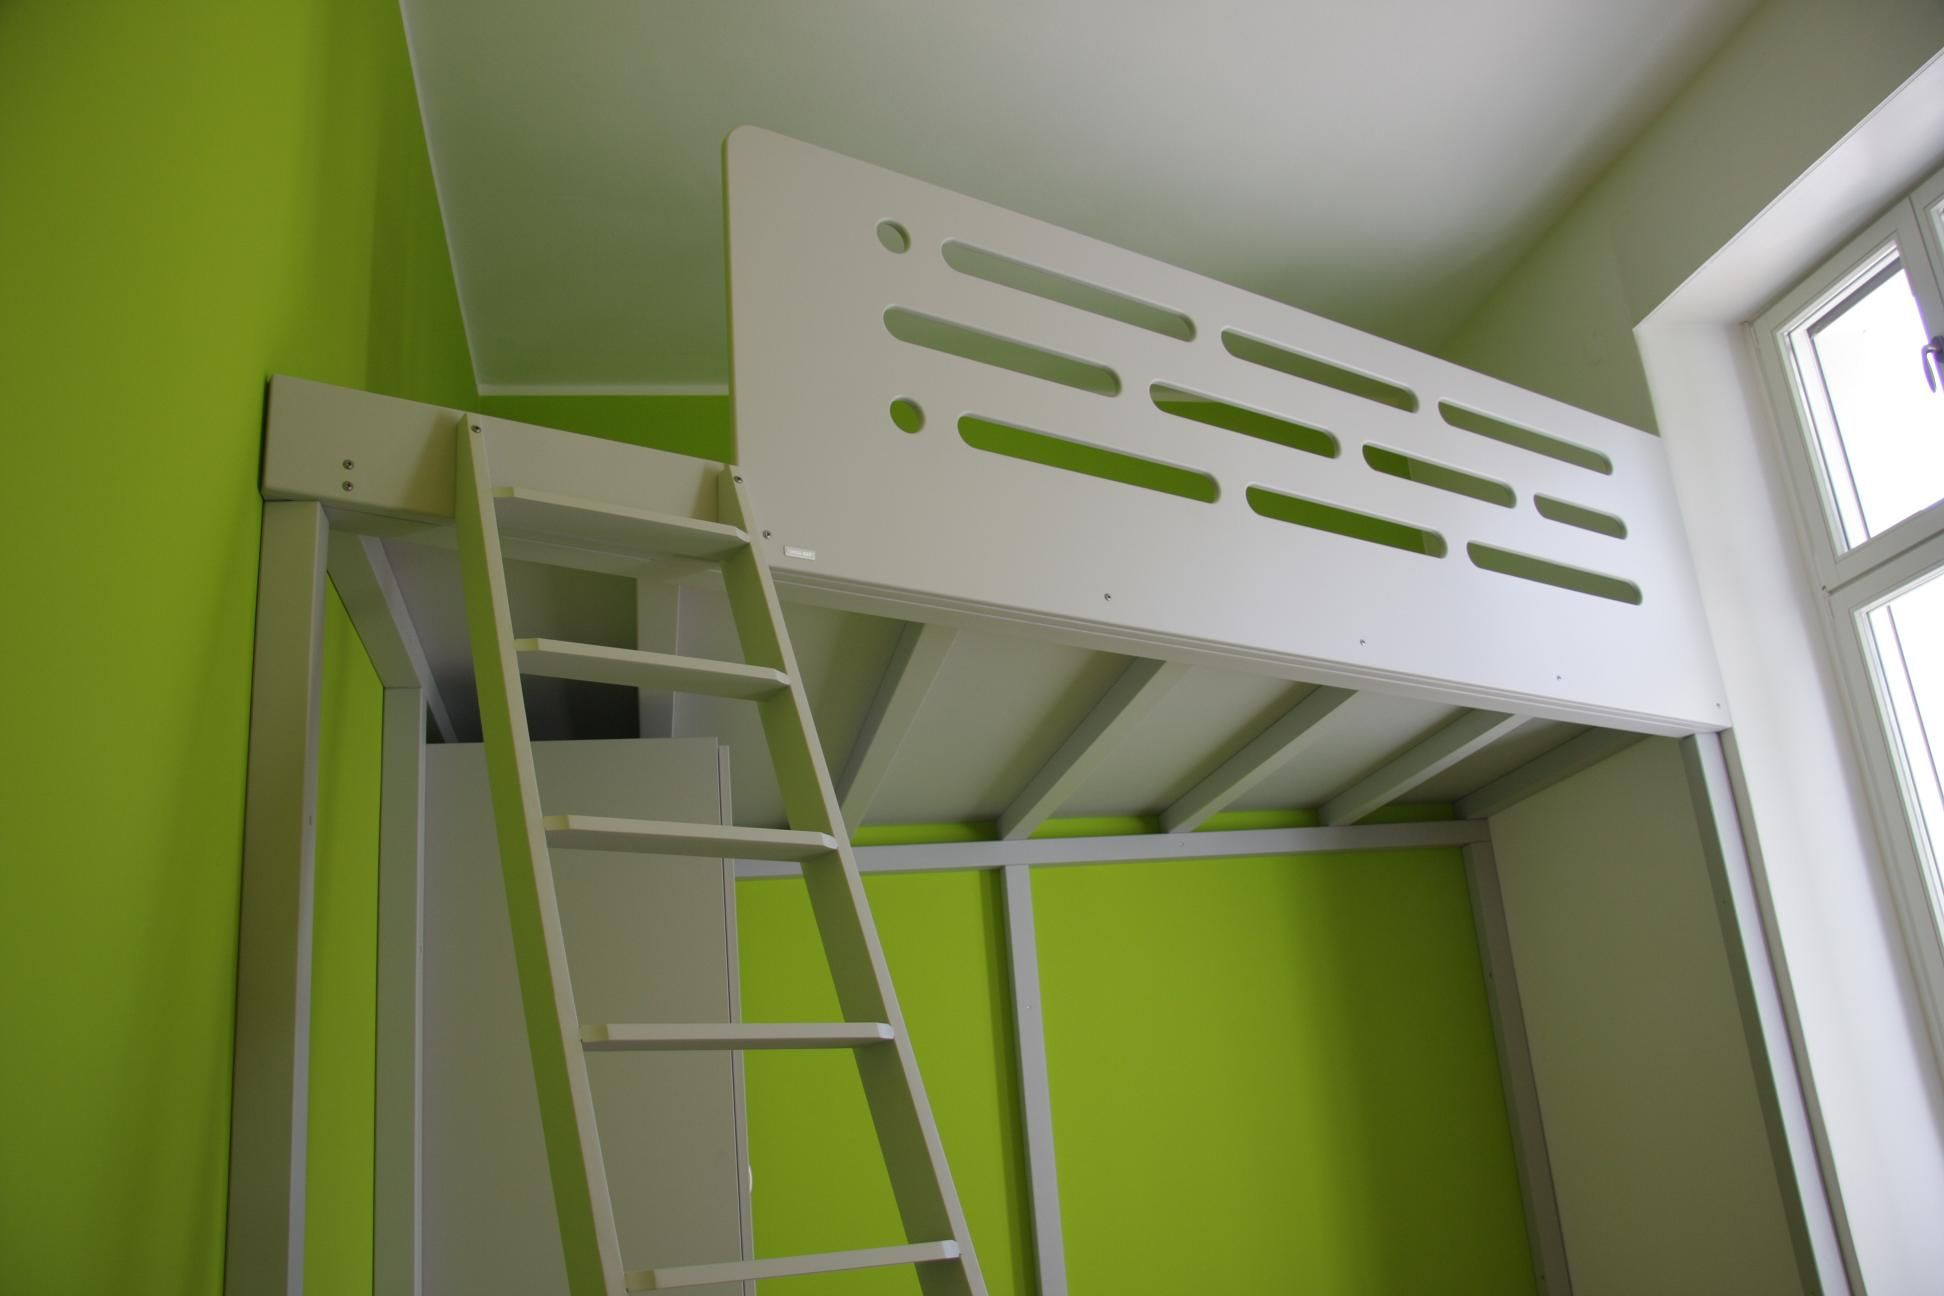 hochbett berlin menke concept gmbh hochetagen galerien kinderbetten tischlermeister. Black Bedroom Furniture Sets. Home Design Ideas